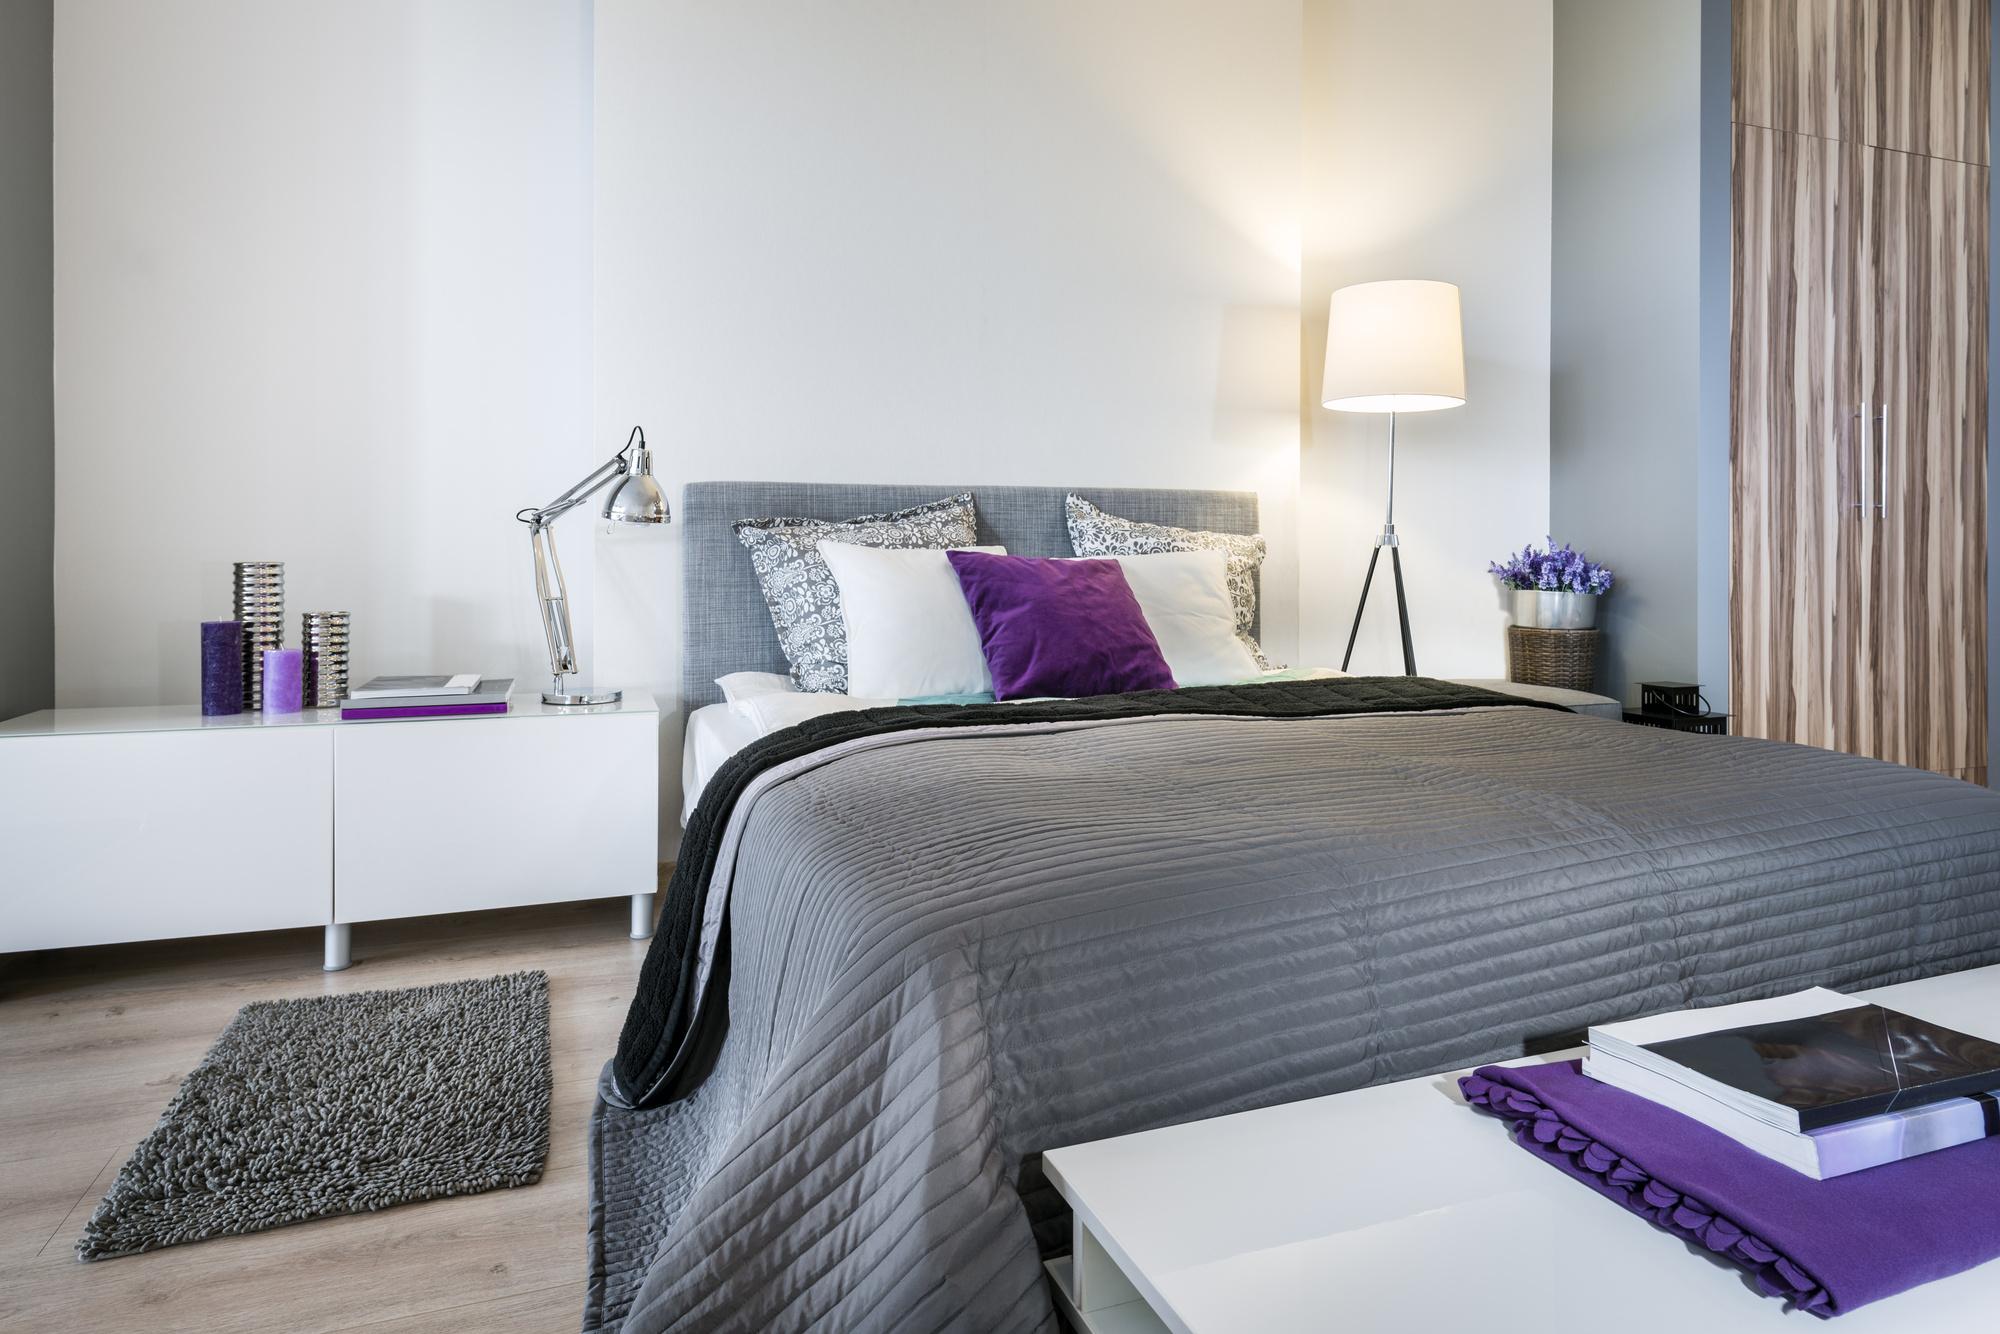 interior designers, custom bedding